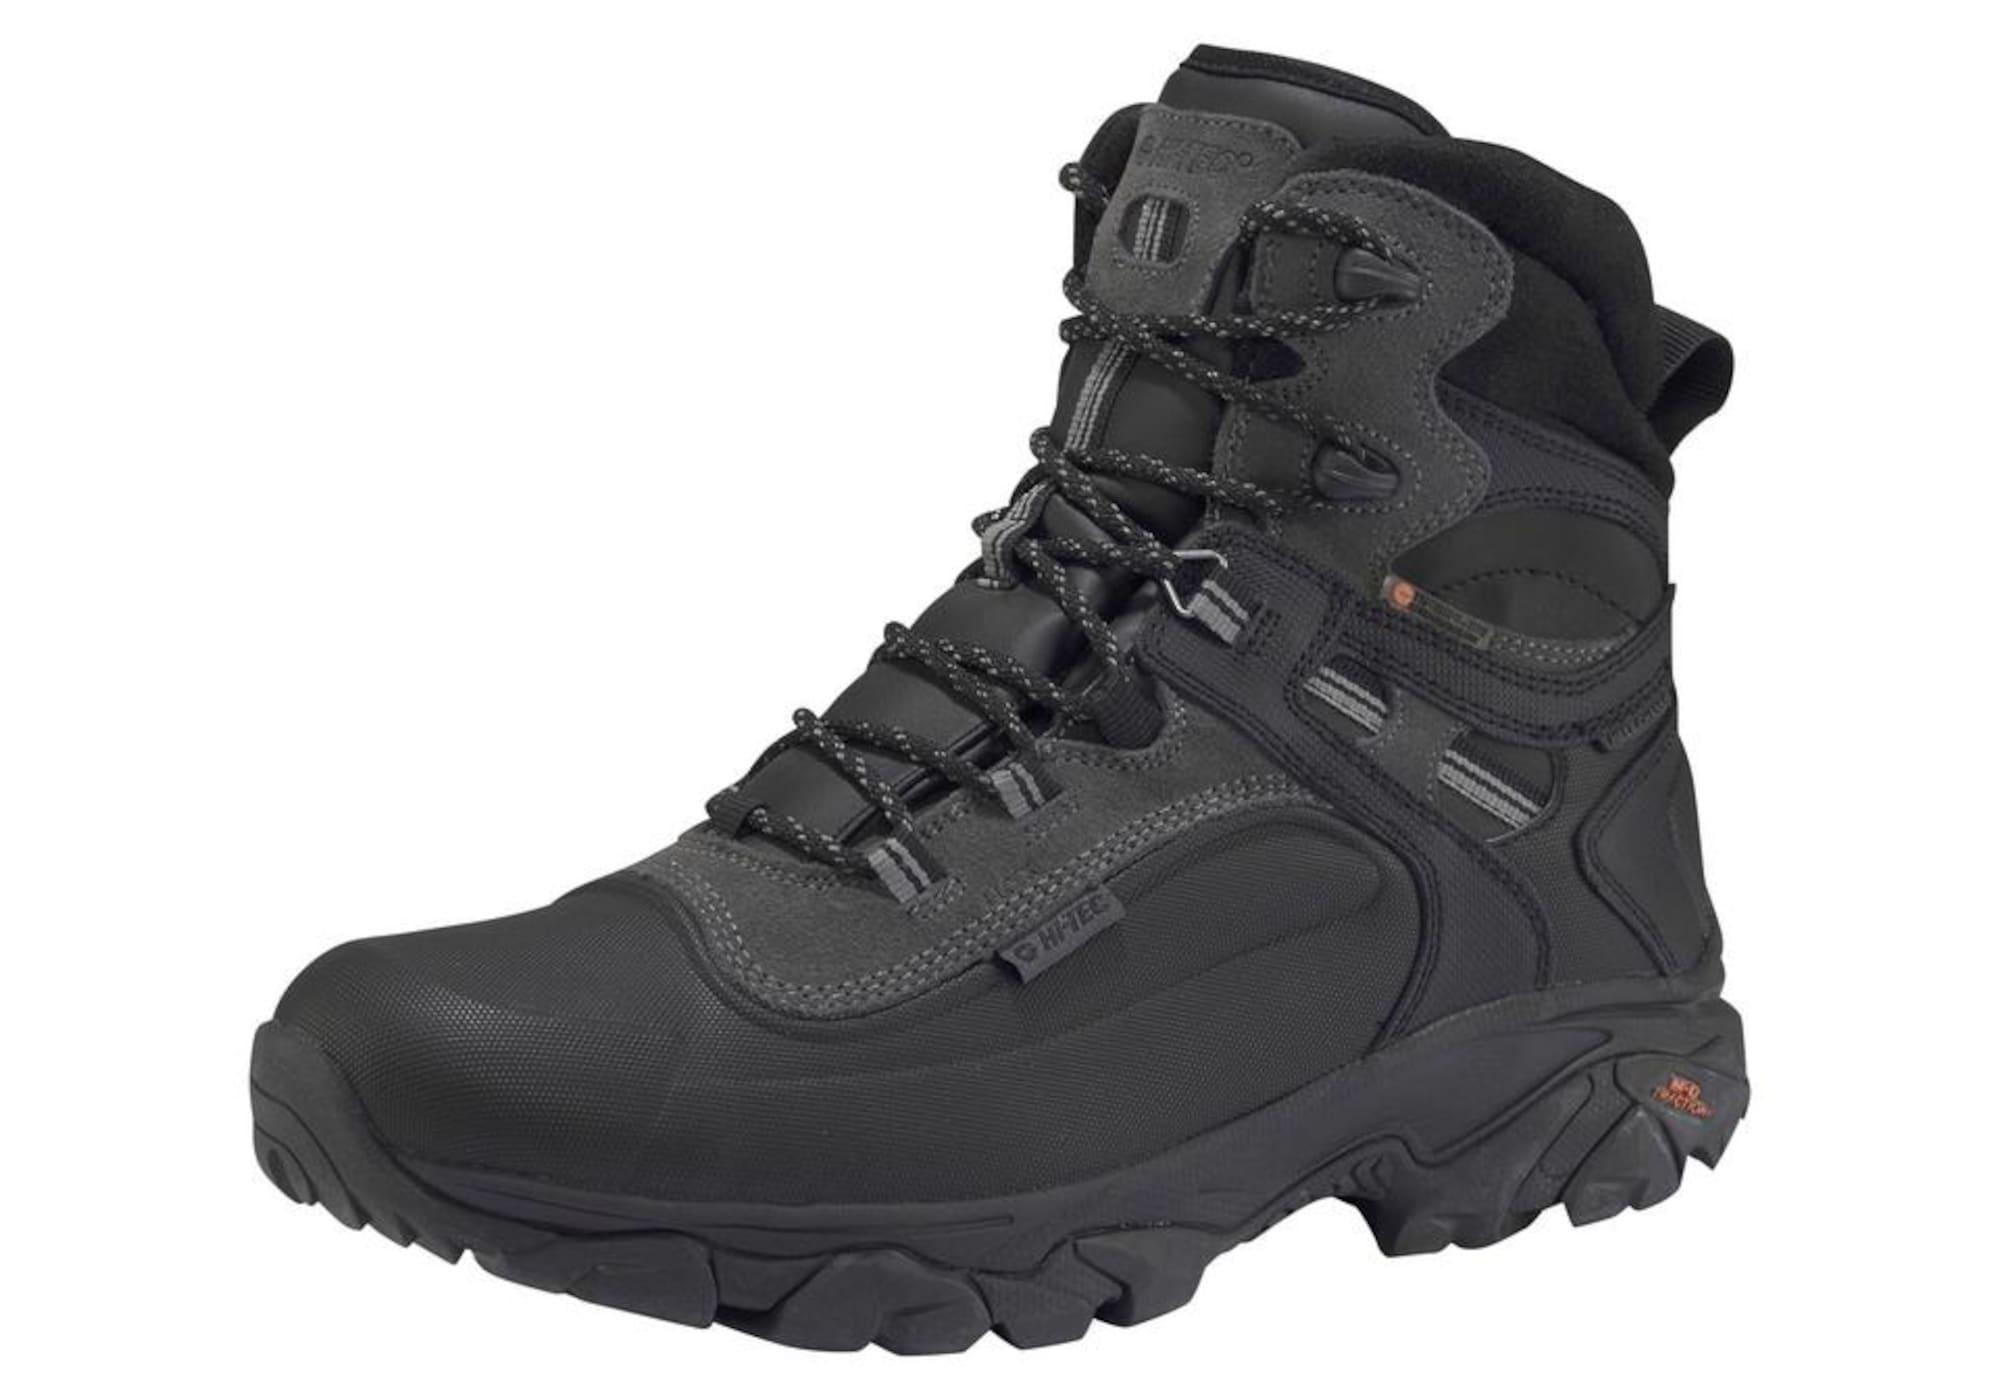 HI-TEC Auliniai batai tamsiai pilka / juoda